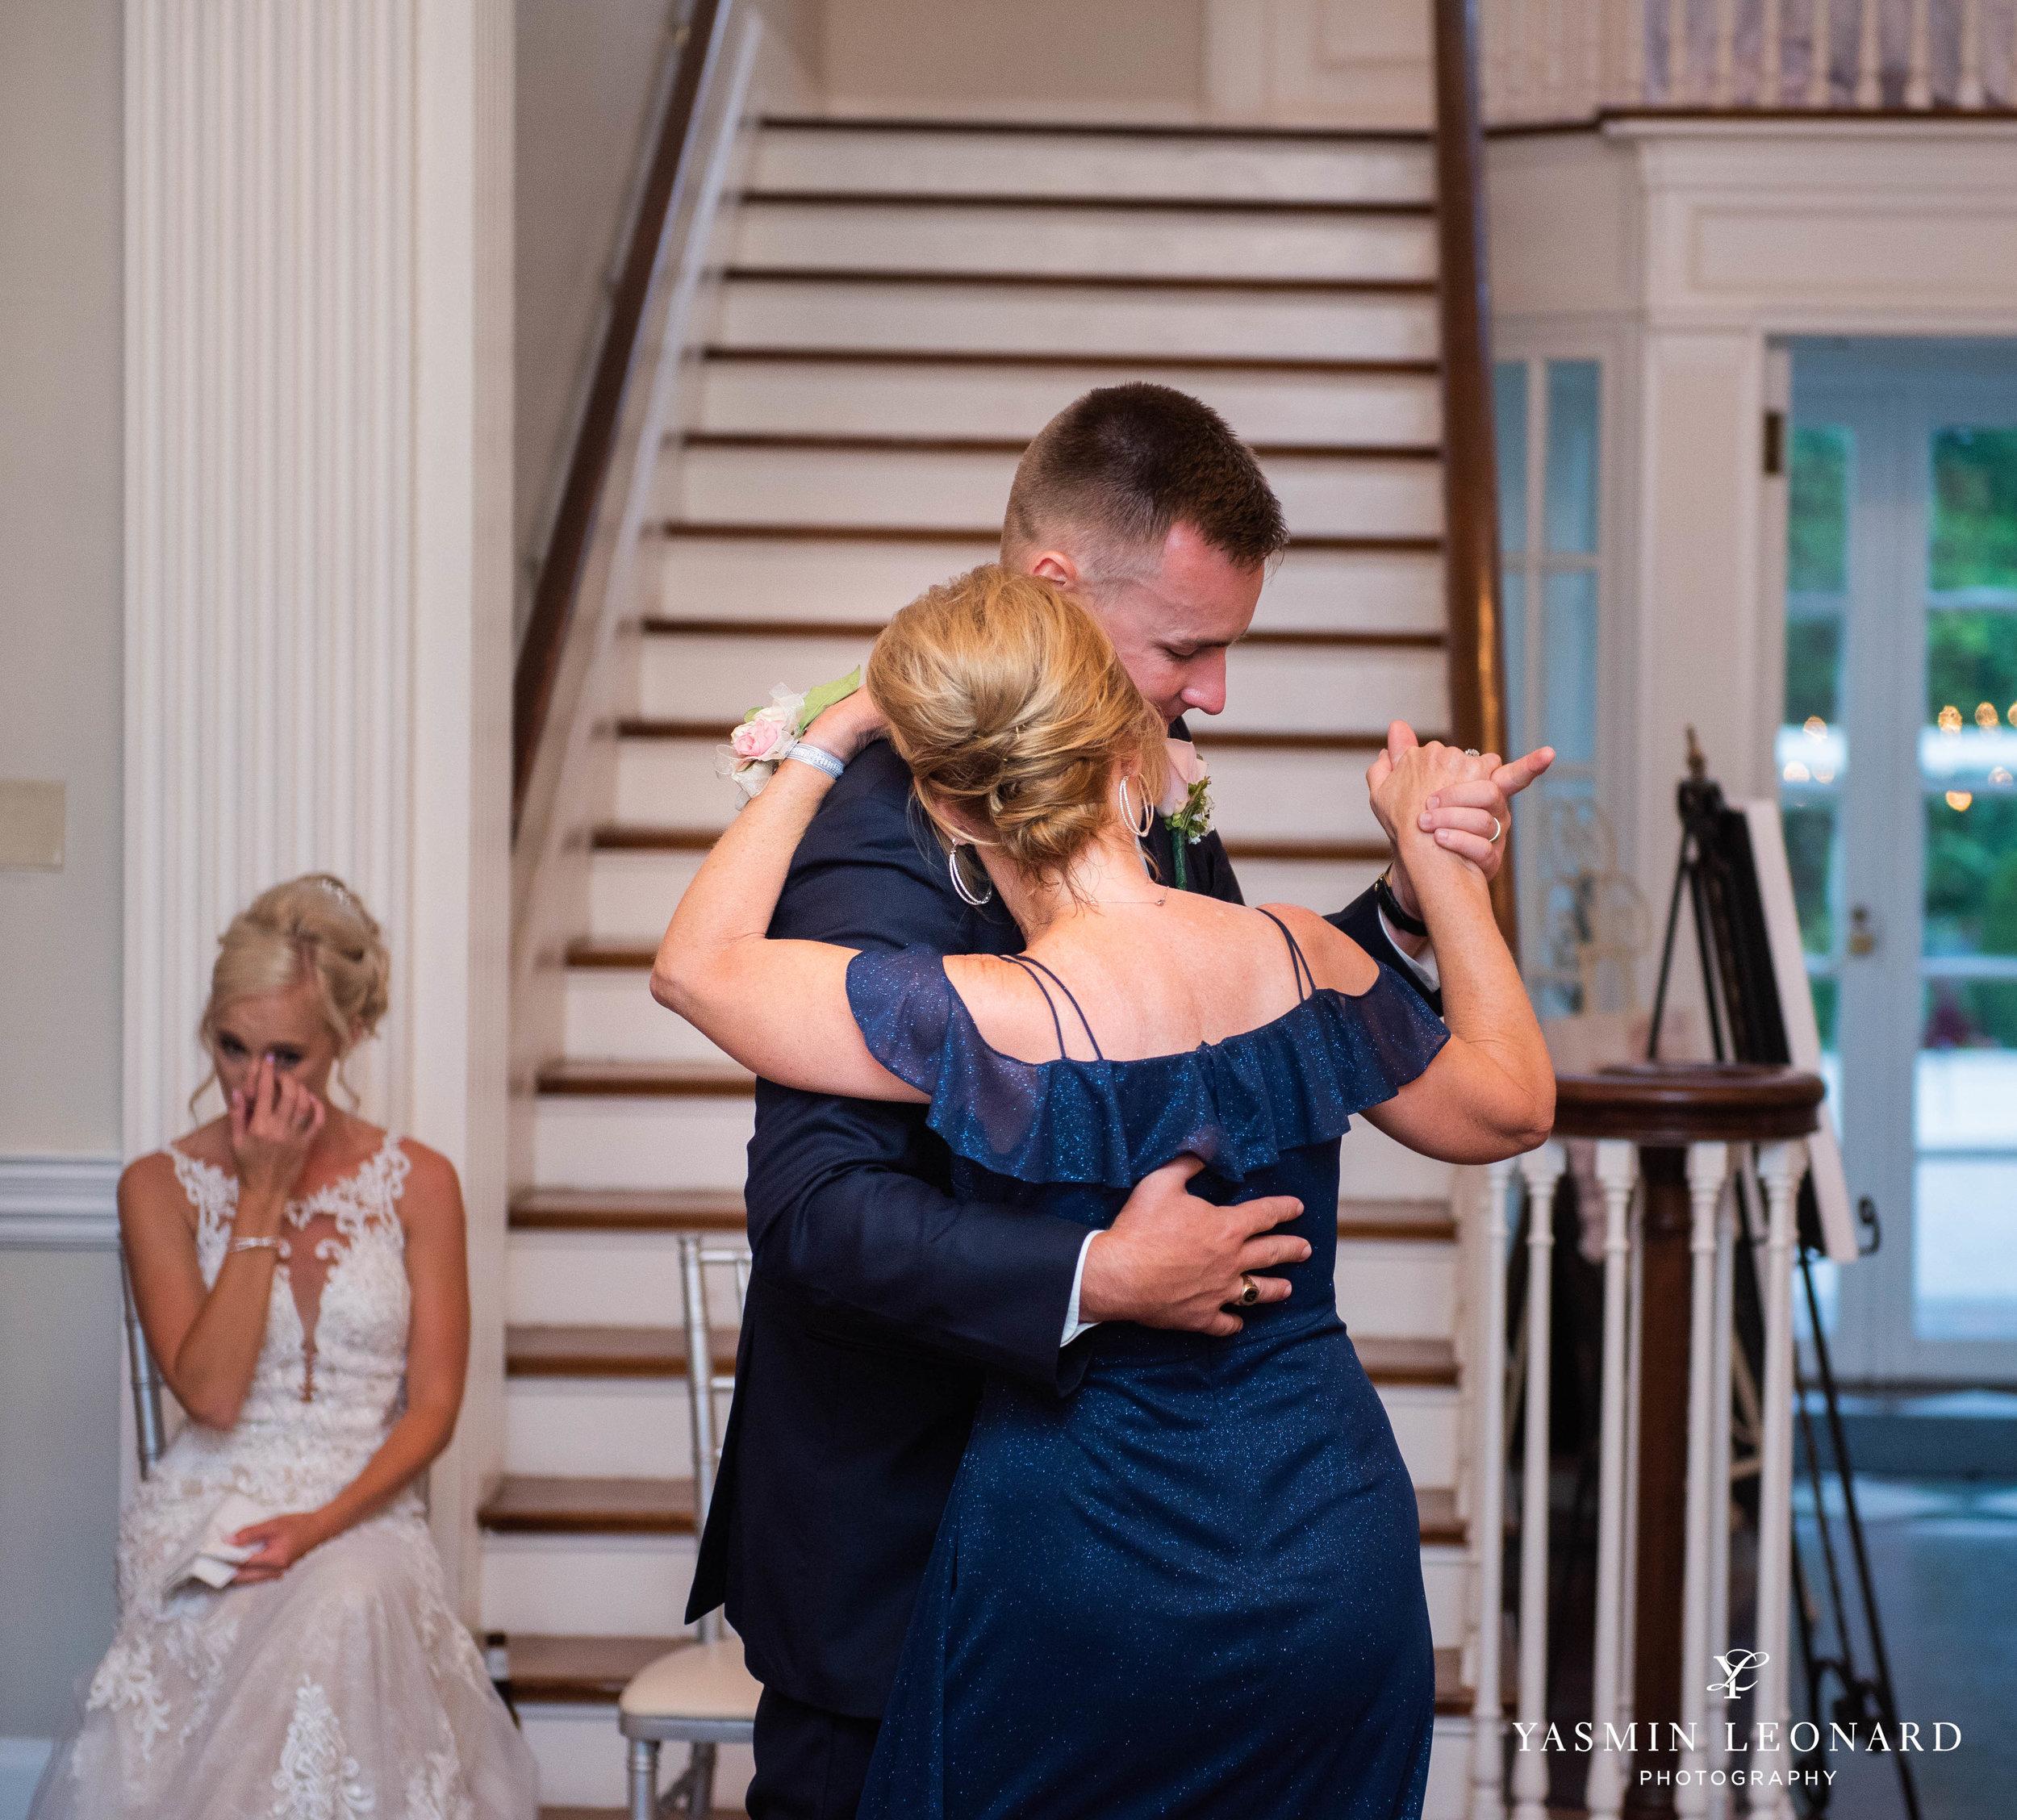 Separk Mansion - NC Weddings - Gastonia Wedding - NC Wedding Venues - Pink and Blue Wedding Ideas - Pink Bridesmaid Dresses - Yasmin Leonard Photography-54.jpg